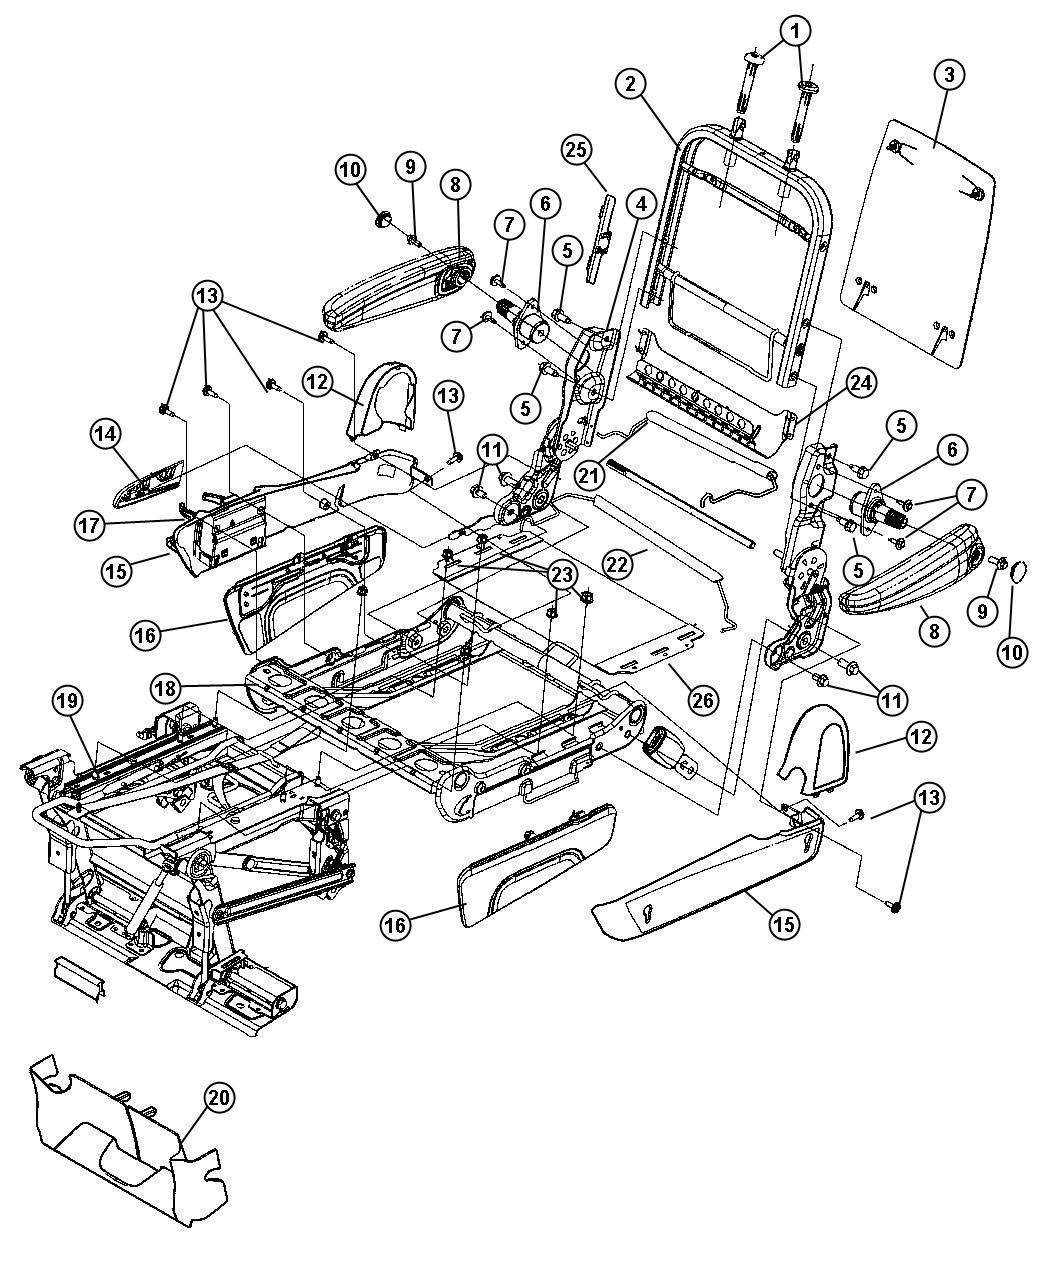 Jeep Patriot Bracket Recline Cover Trim Seats